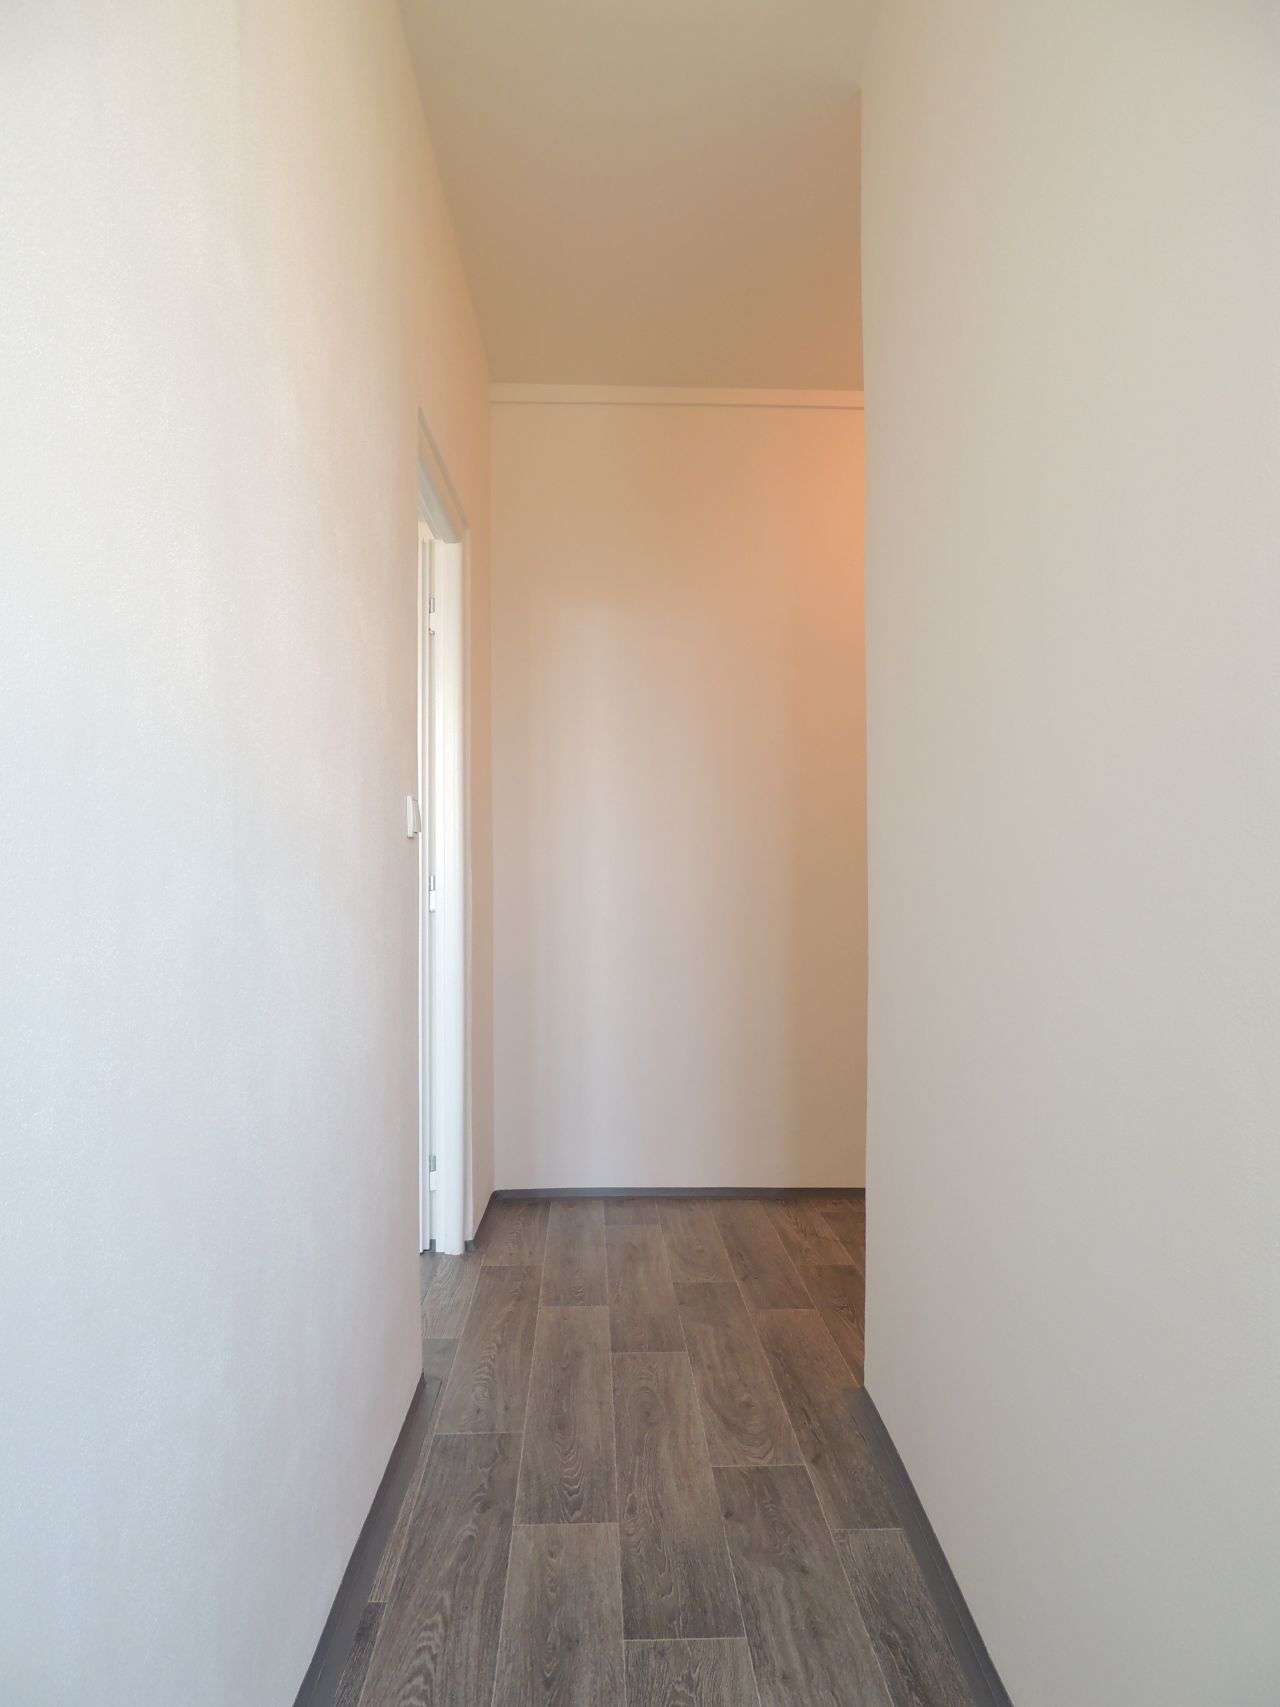 Pronájem bytu 1+1 38 m2, ul. Josefa Kotase 1173/29, Ostrava - Hrabůvka